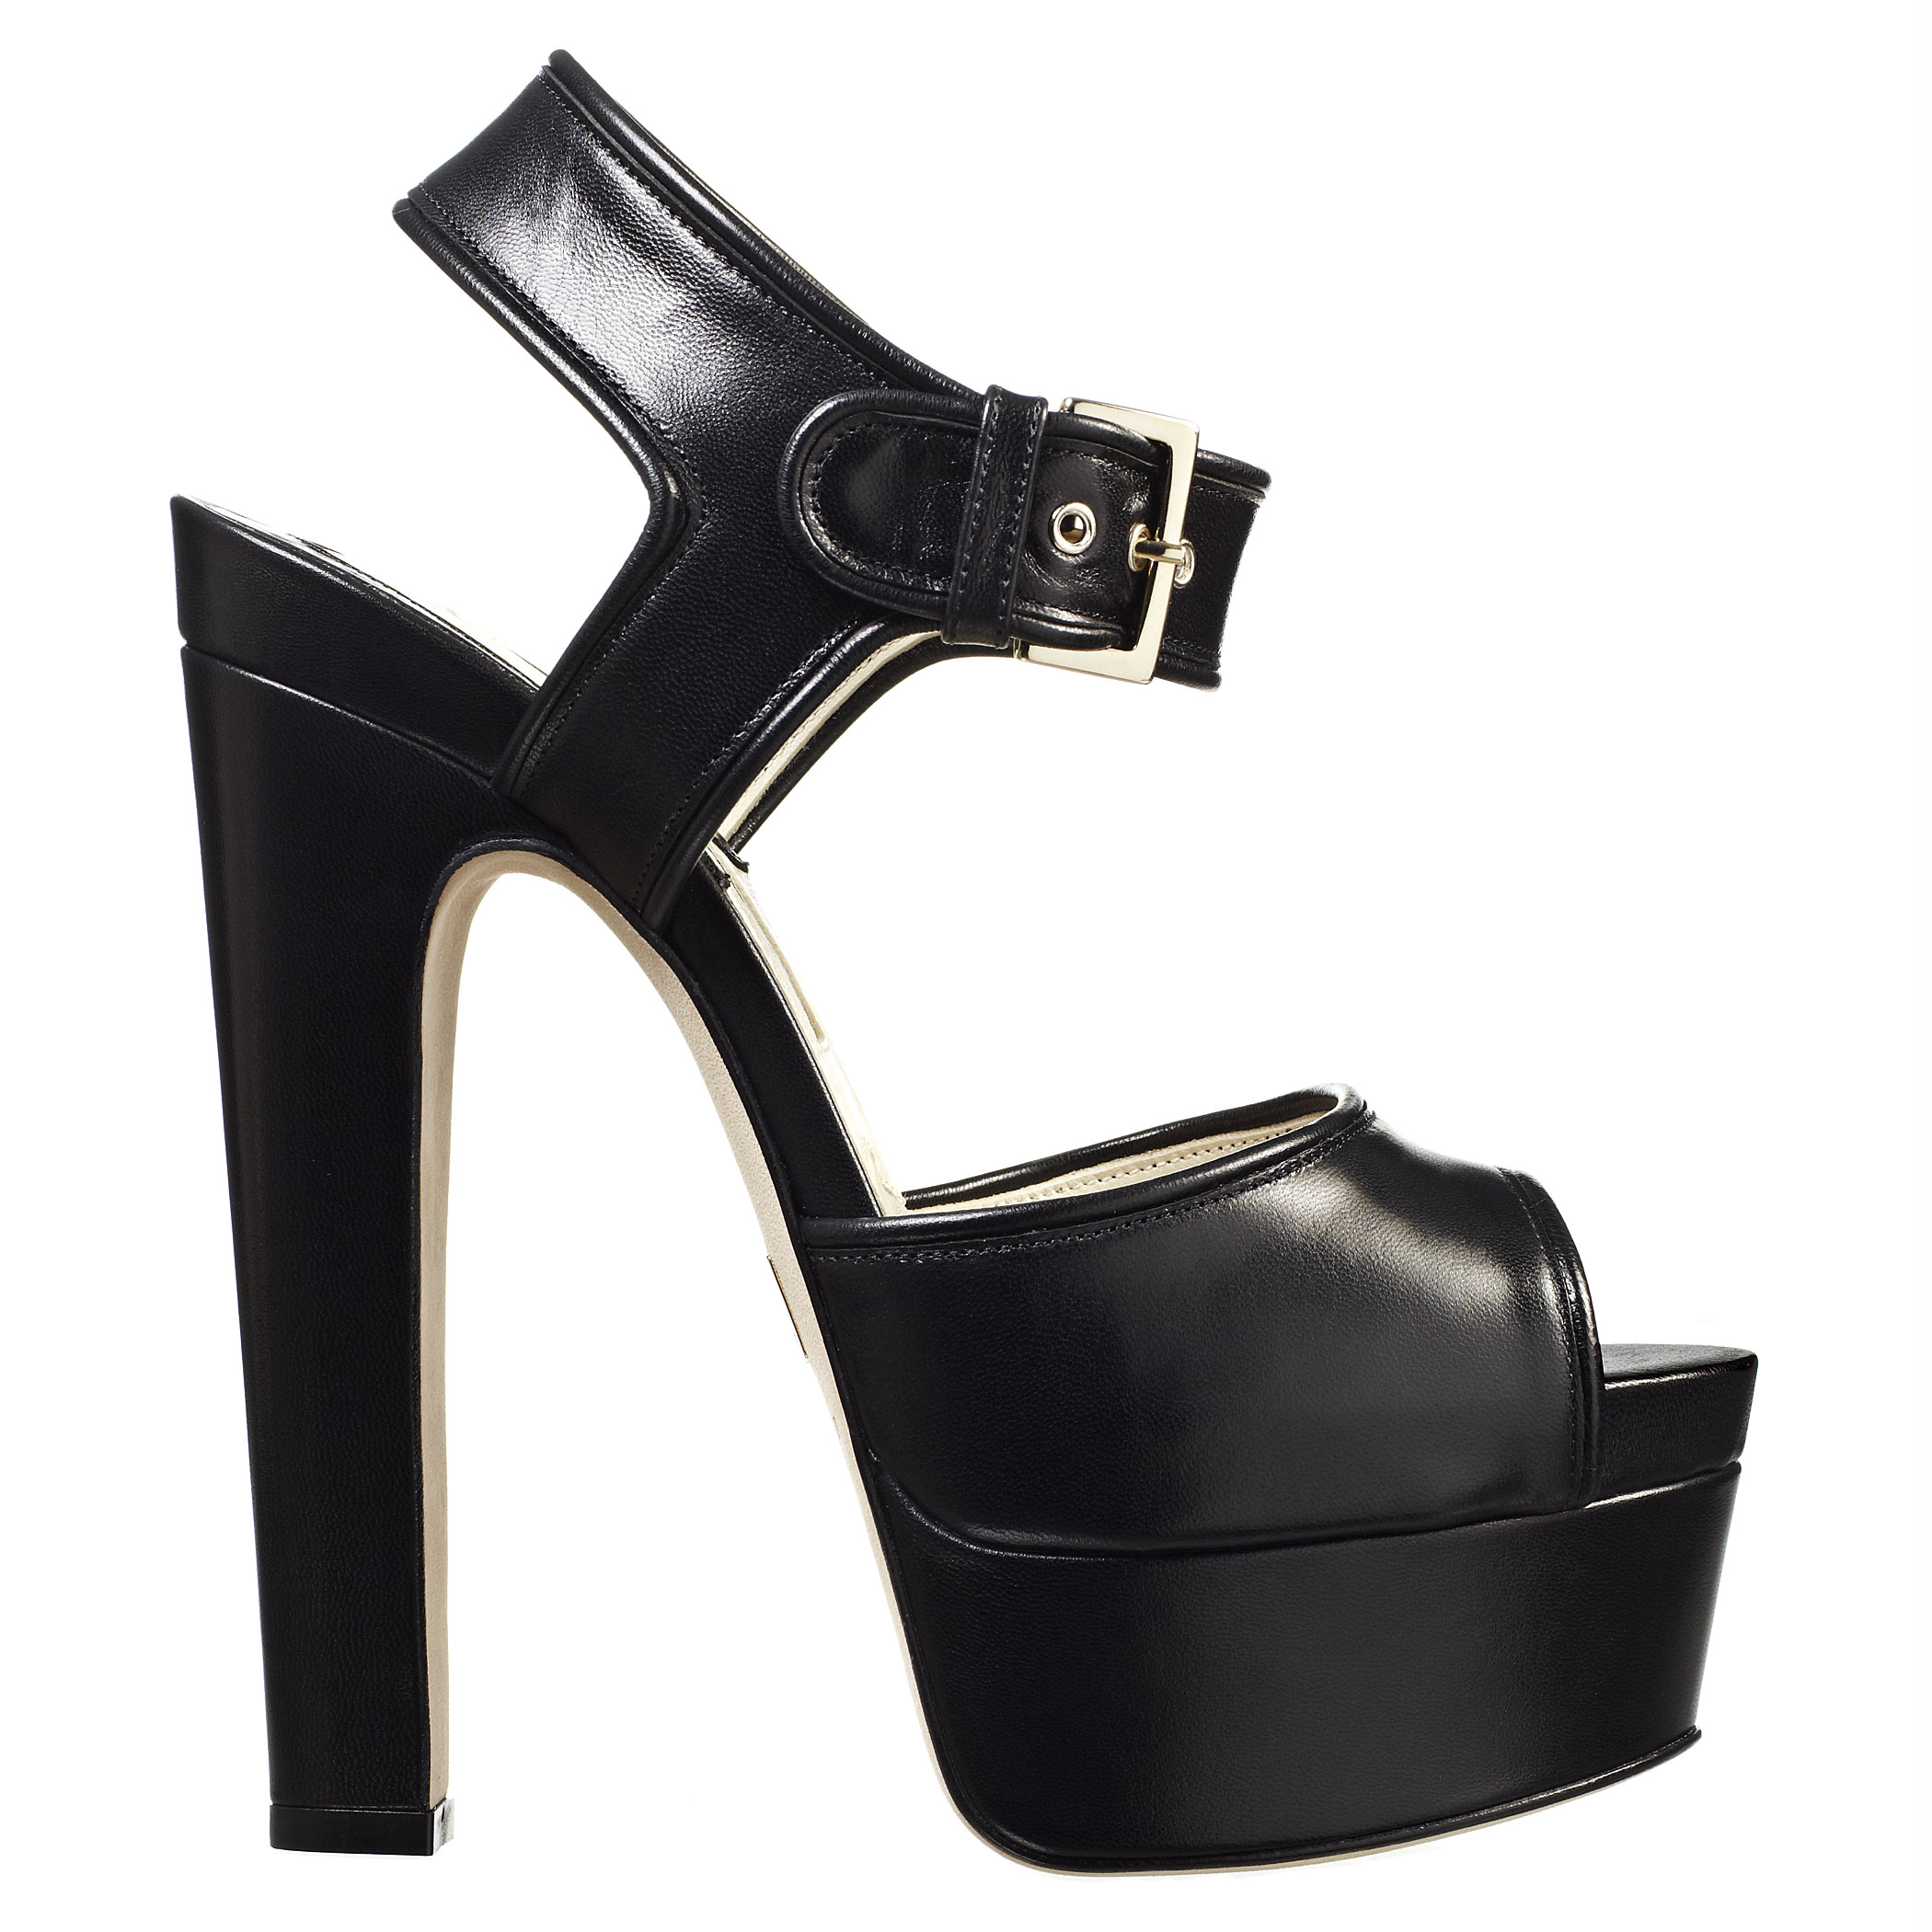 Brian Atwood | Karin sandal